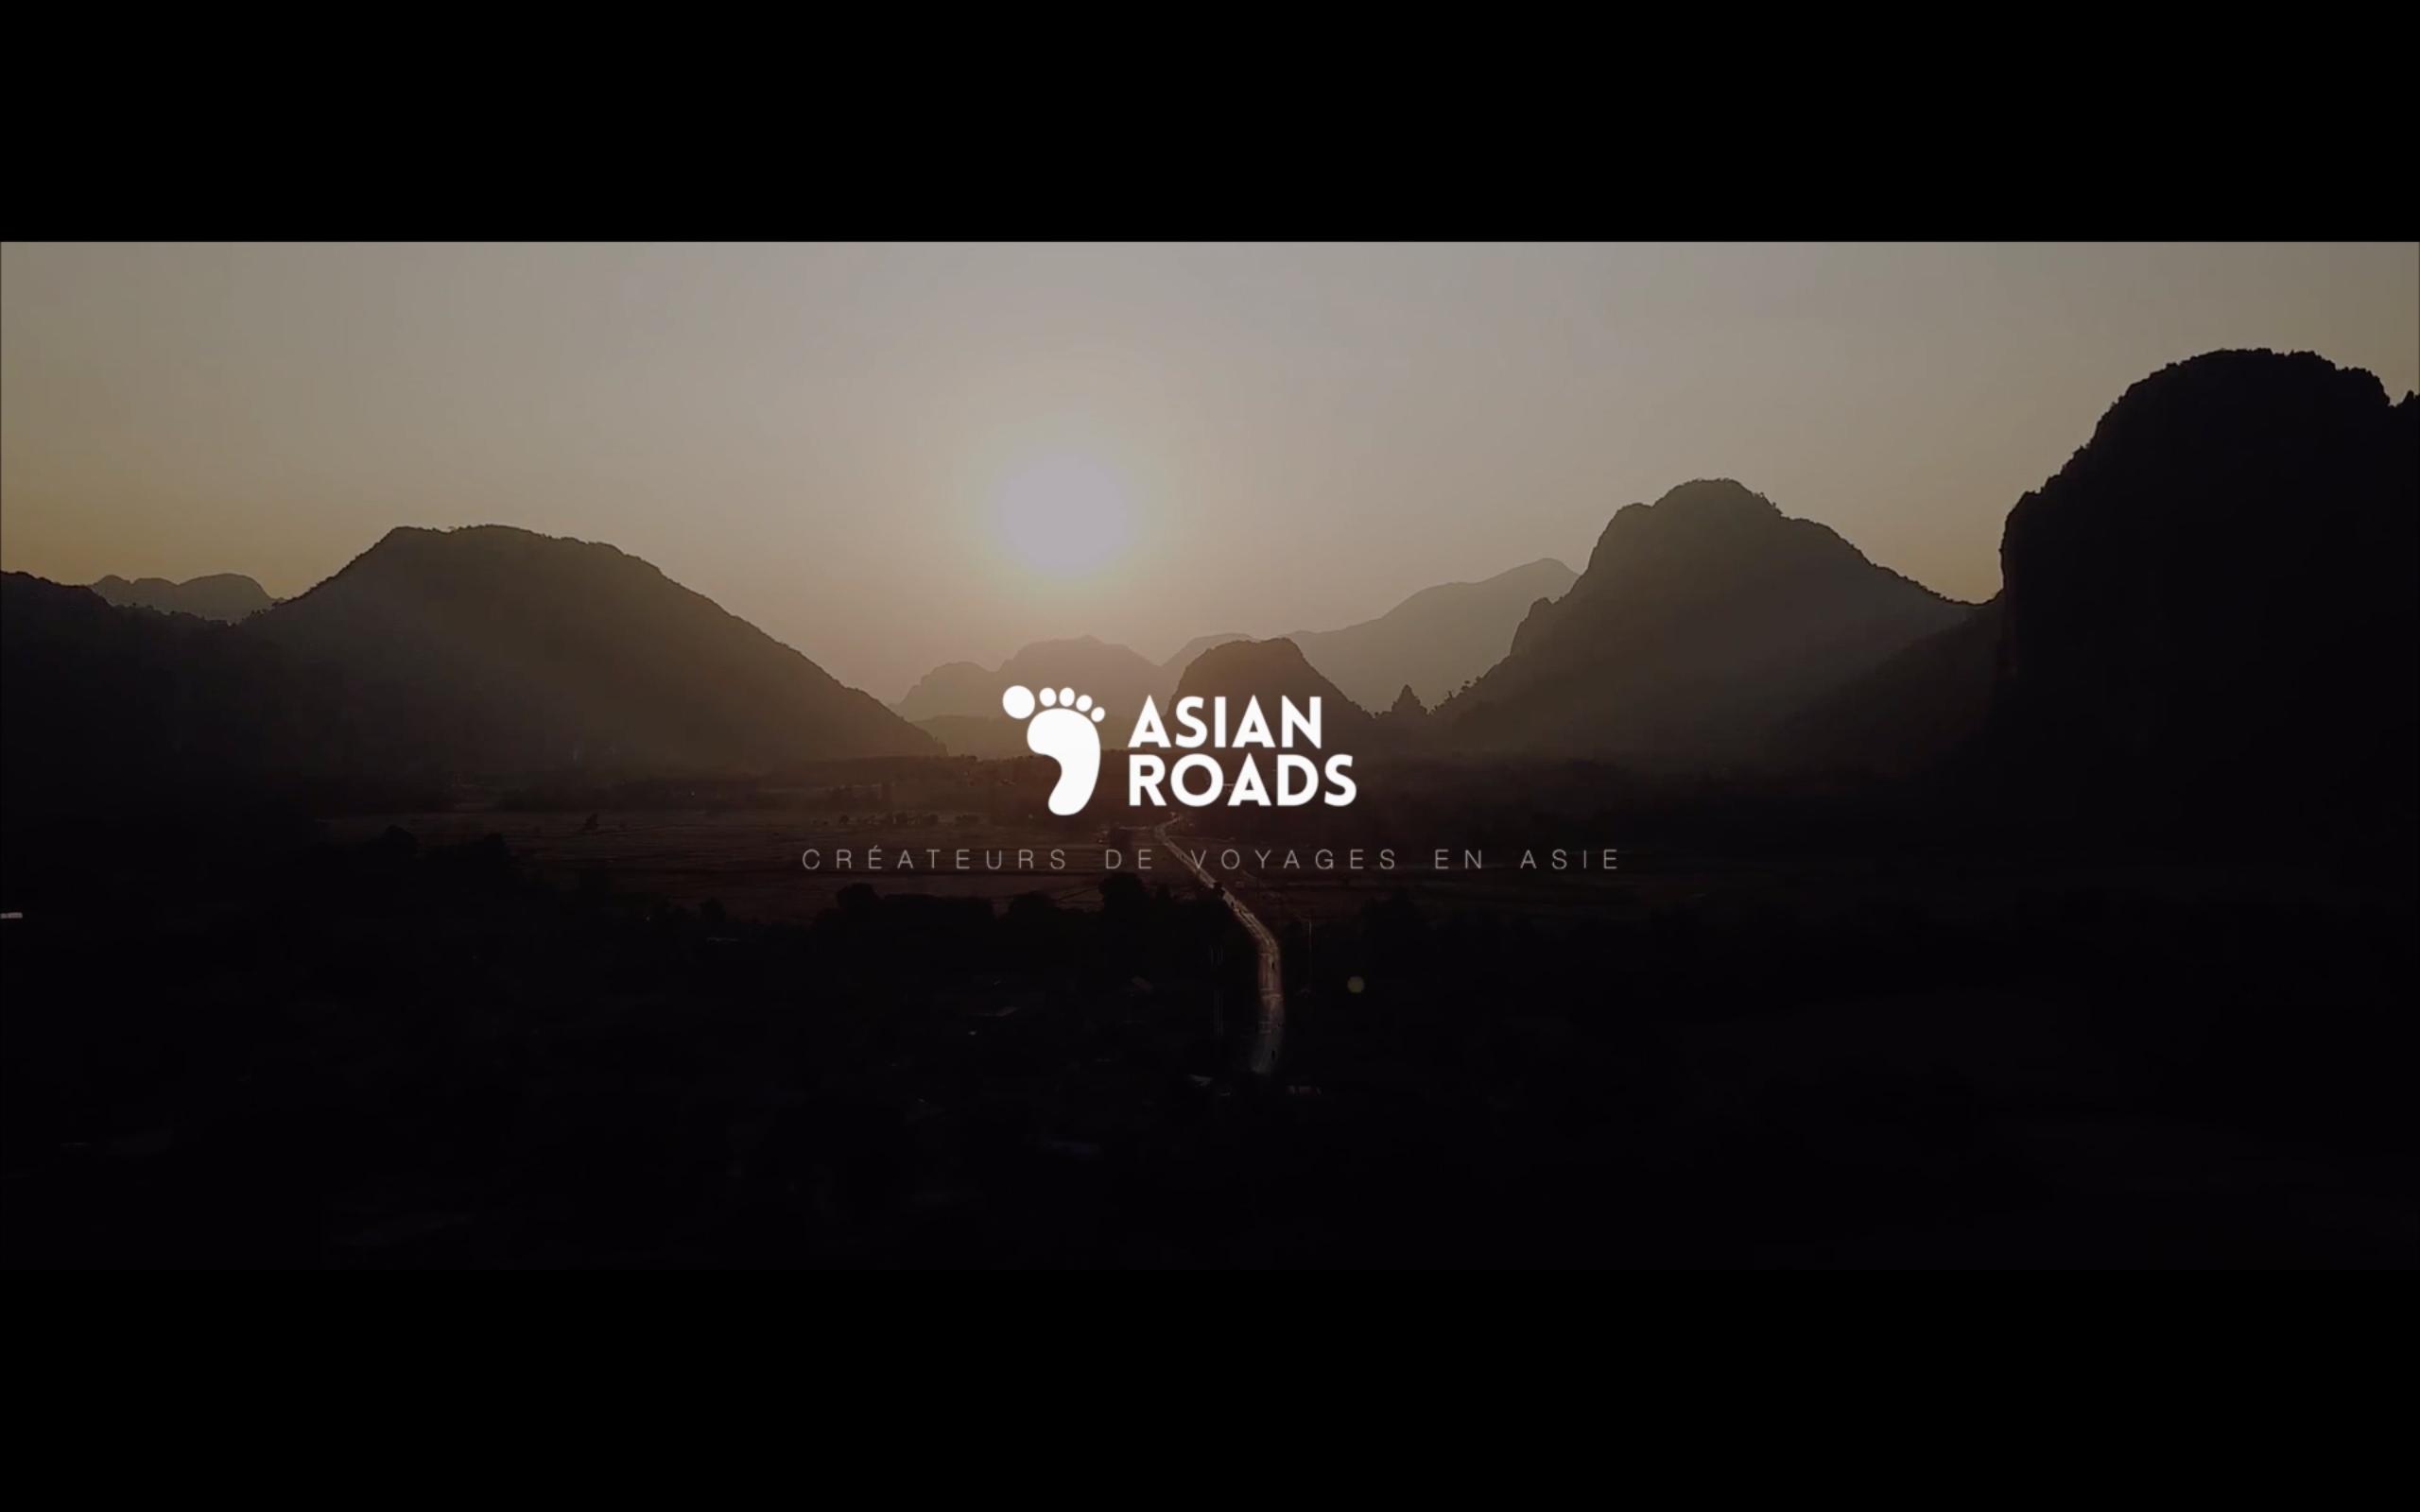 Vidéo Voyage Asian Roads